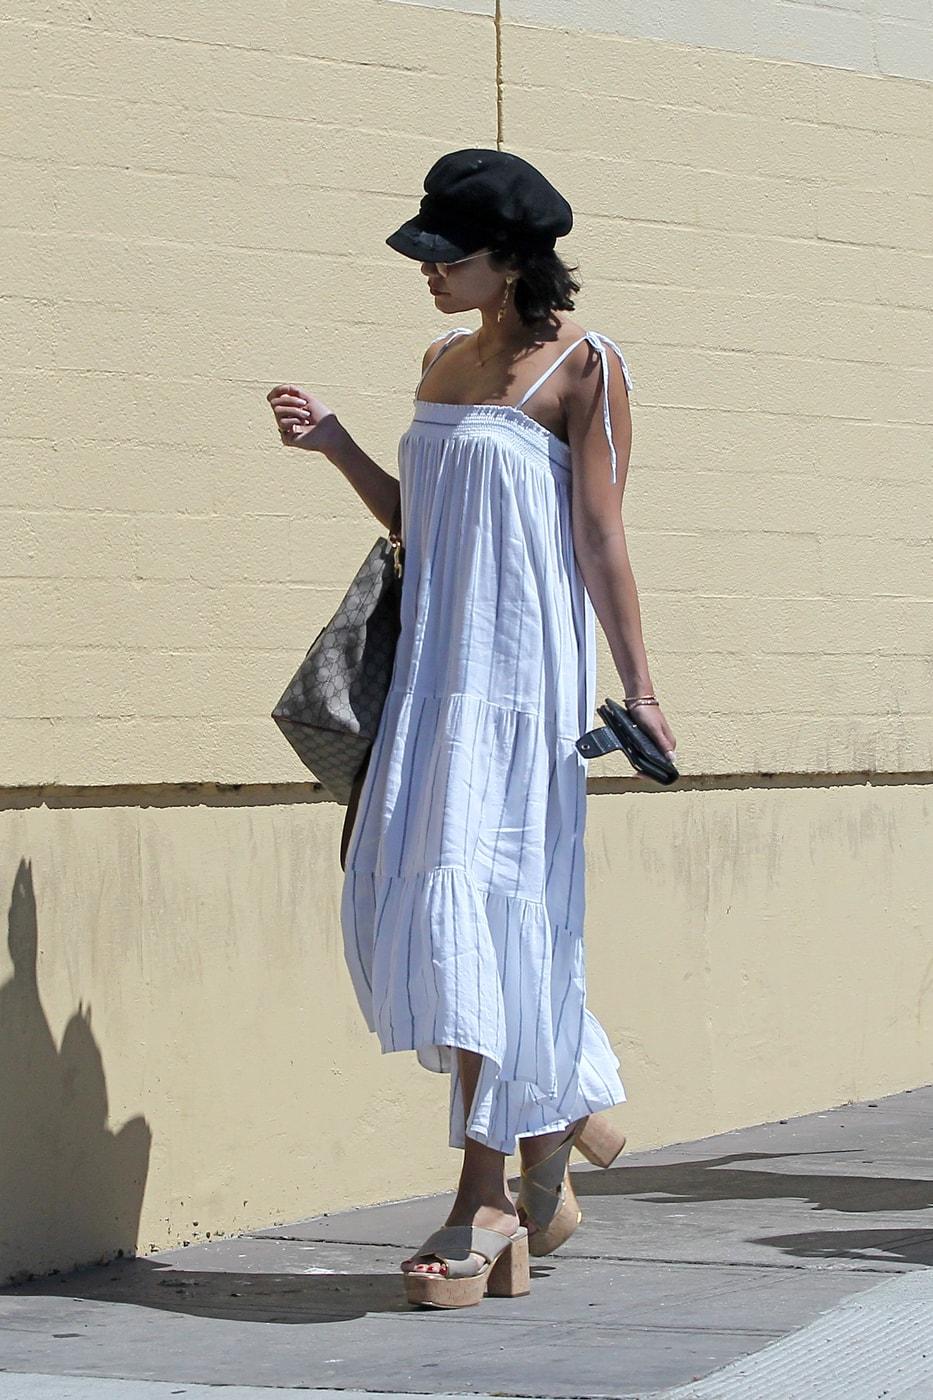 Celebrity fashion: Vanessa Hudgens wearing a white linen dress, oversized tote bag, baker boy cap in black, and chunky platform heels